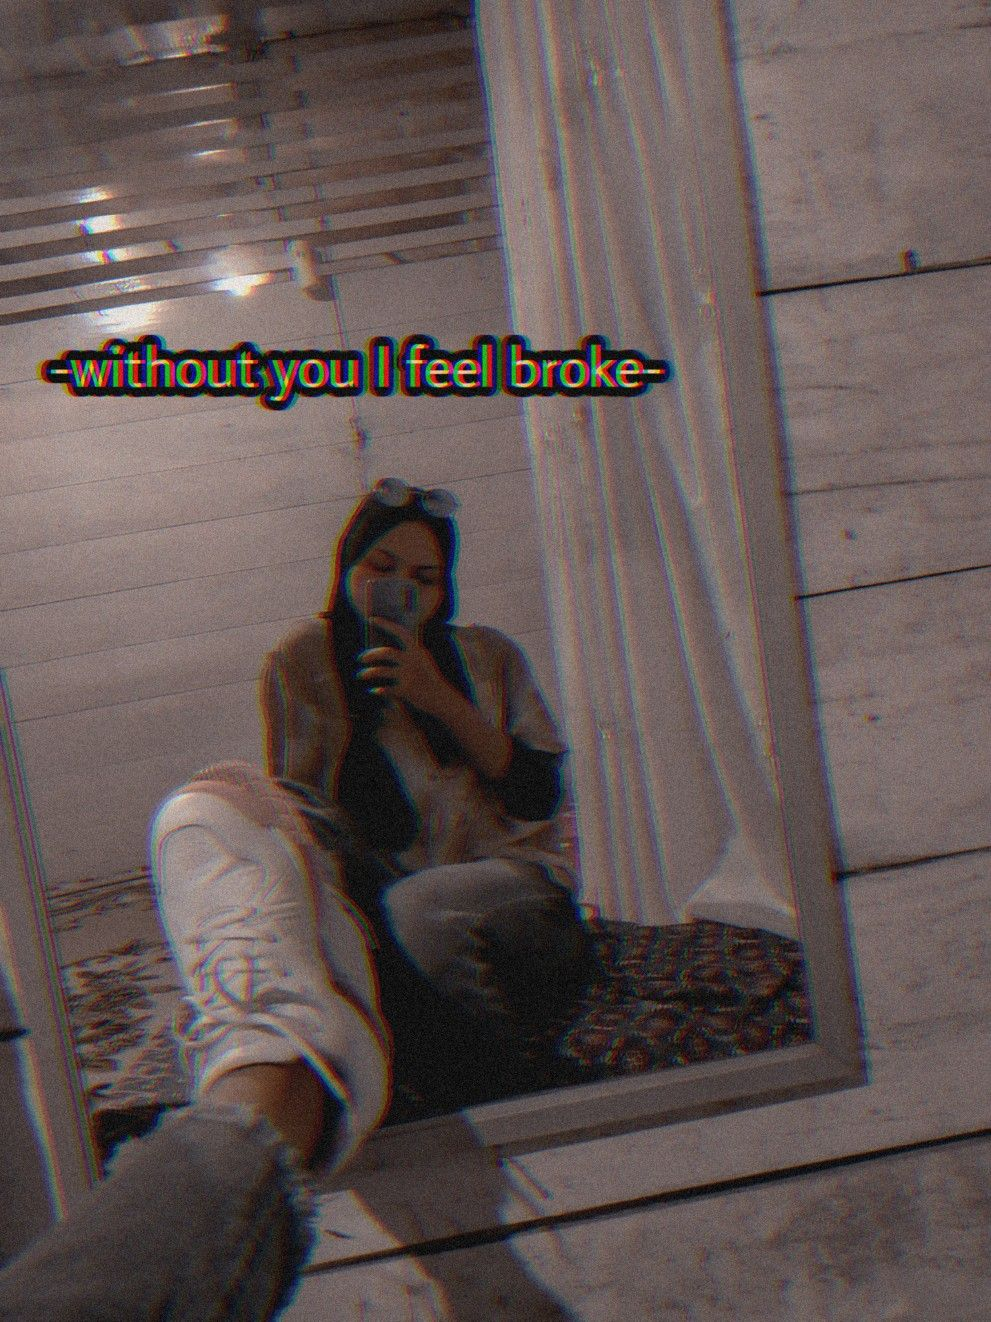 #quote#quotes#love#broke#broken#heart#wethekings#good#night#ambyar#story#everything